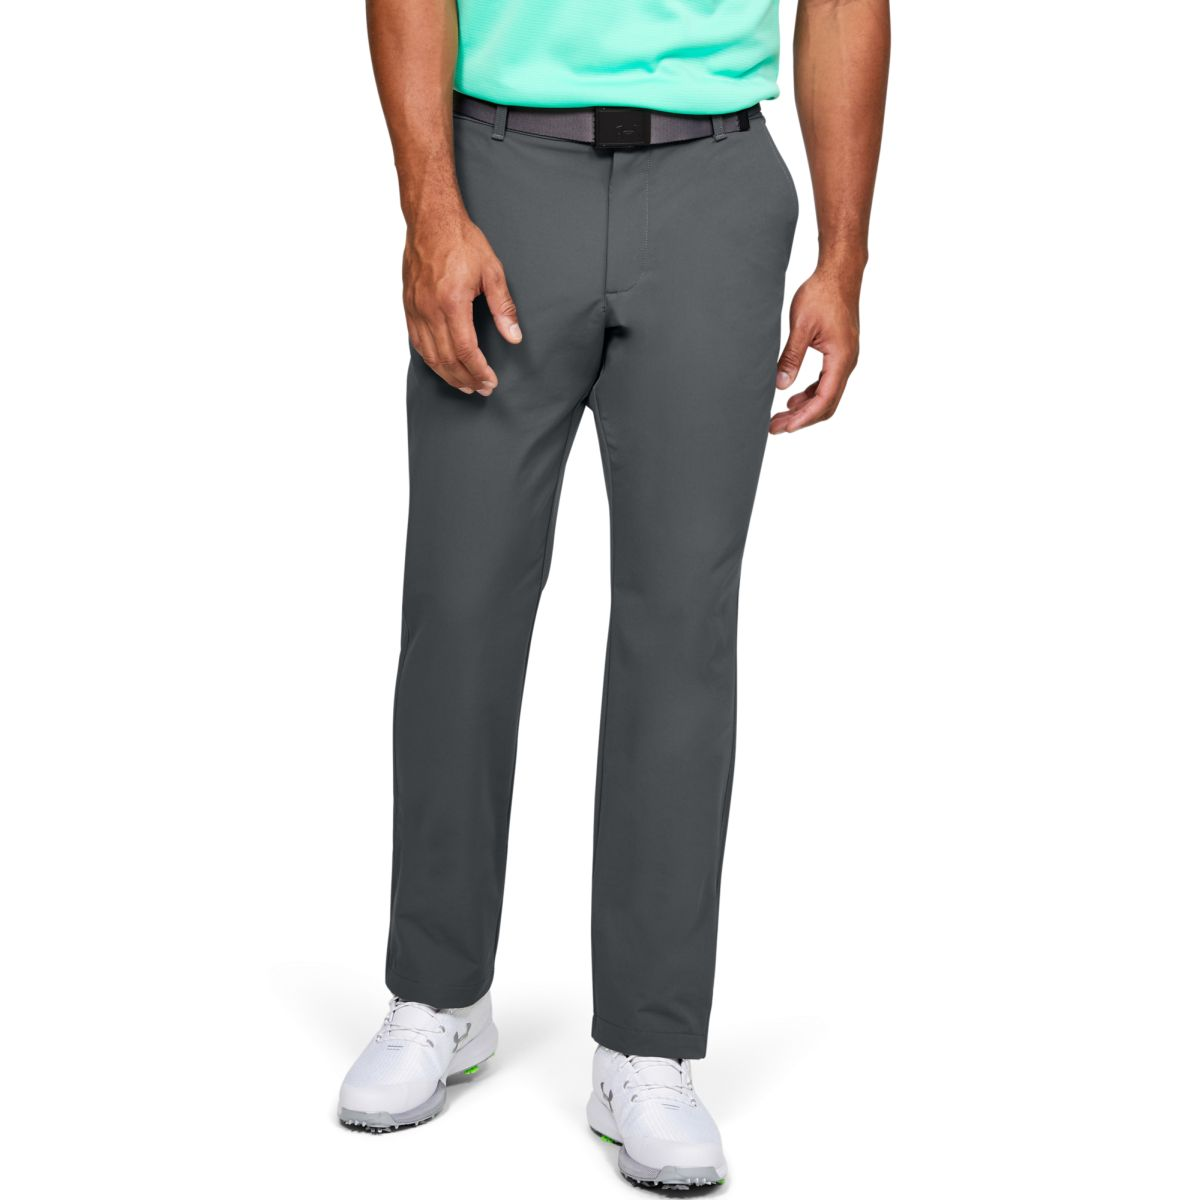 Kalhoty Under Armour UA Tech Pant-GRY